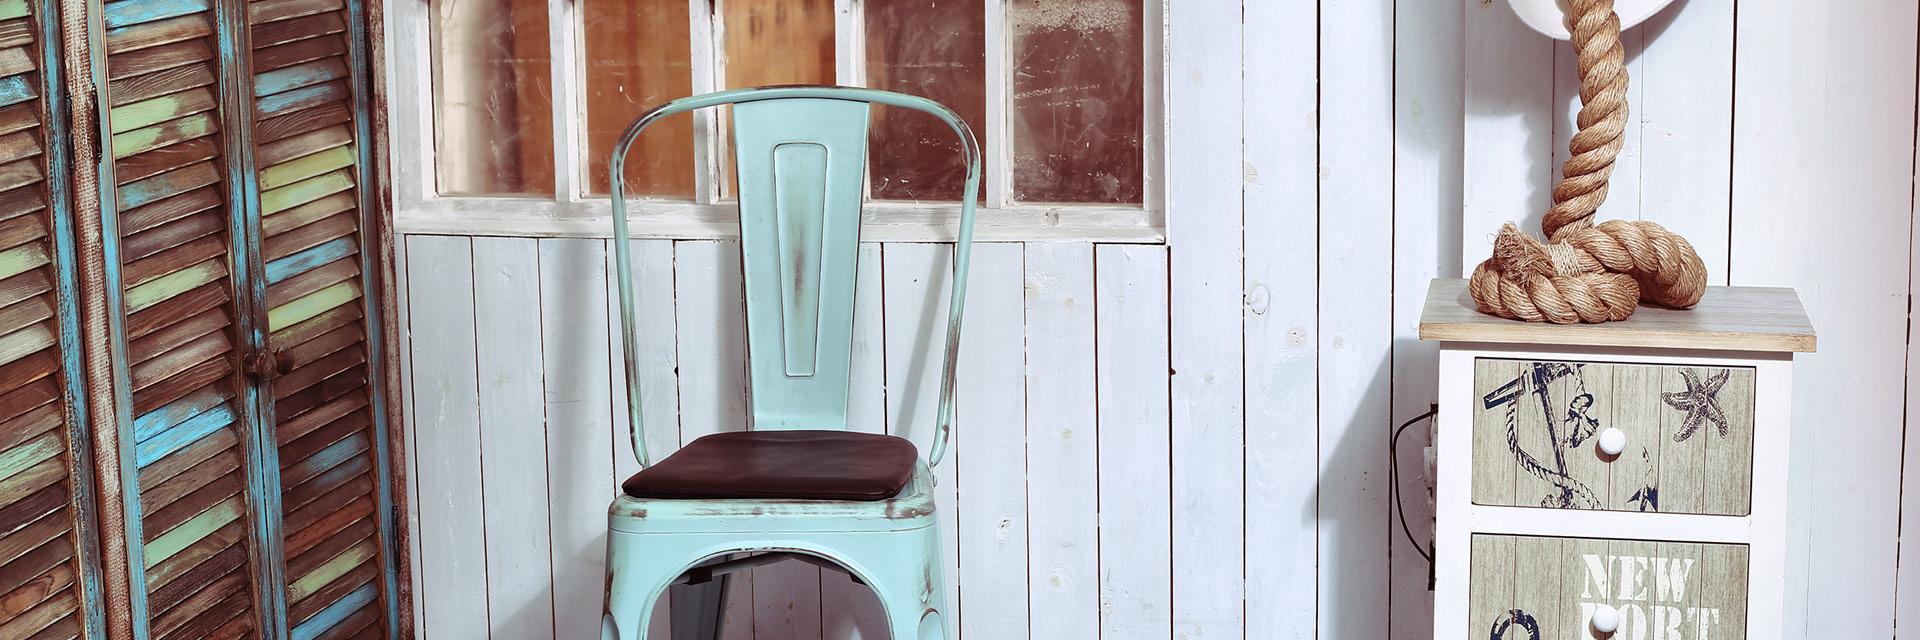 Lebensmittel im Kühlschrank richtig lagern